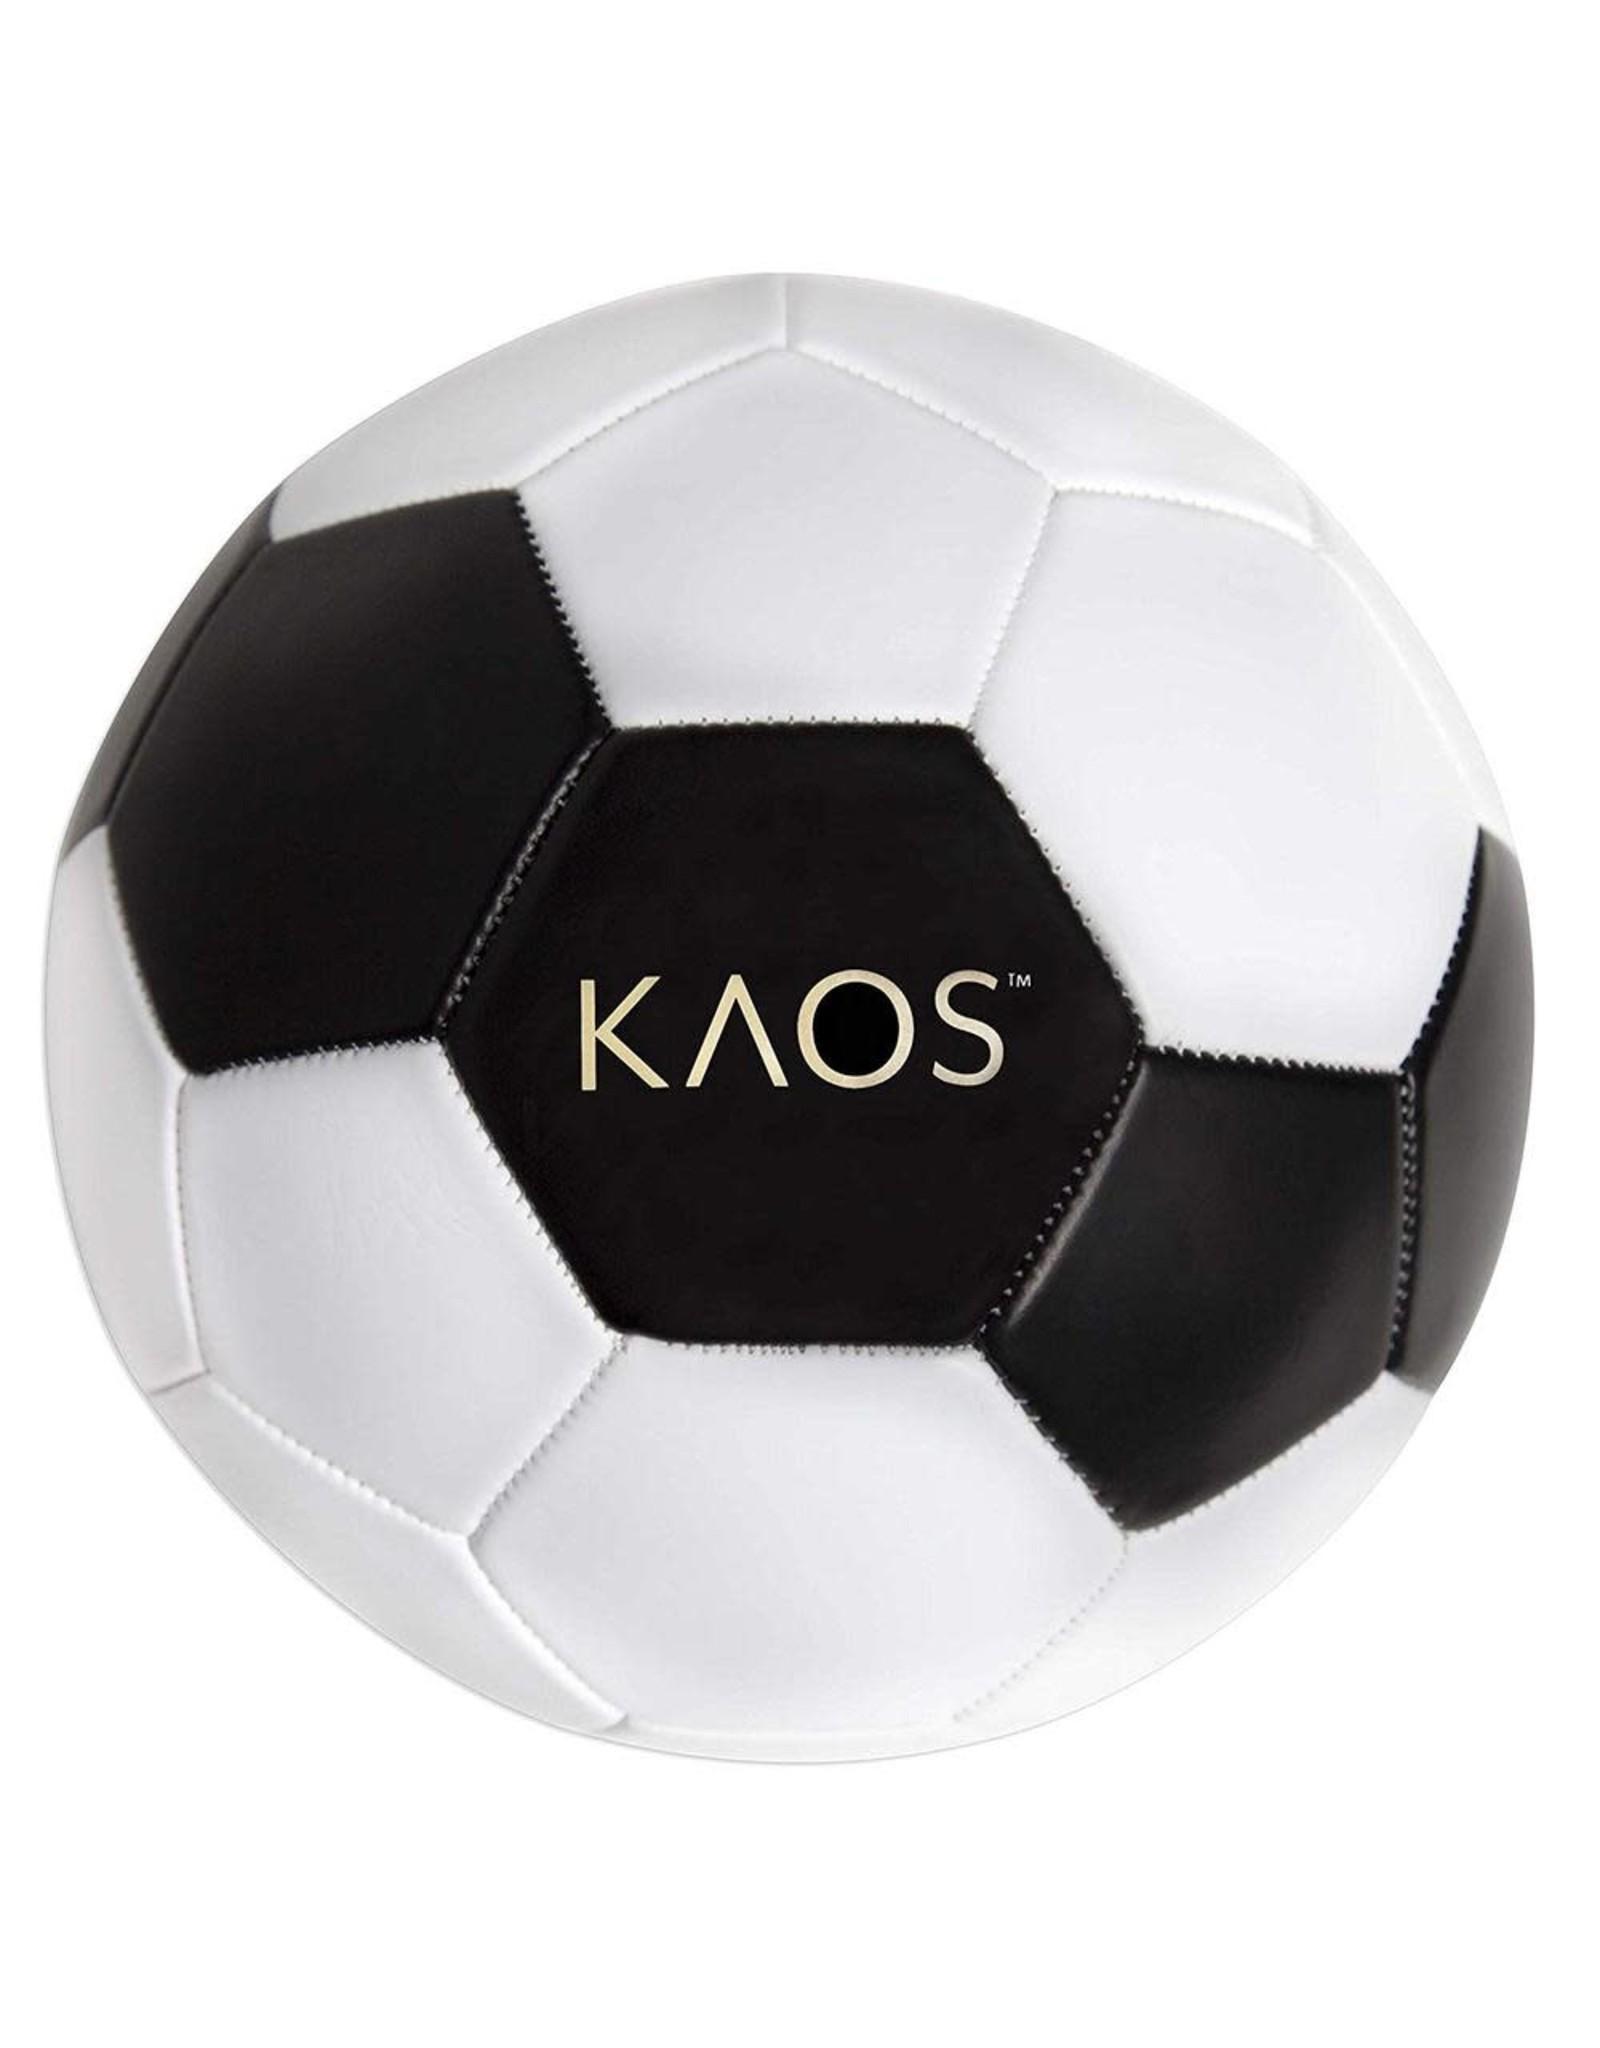 inQbrands, Inc Soccer Ball, Boom, White Black,